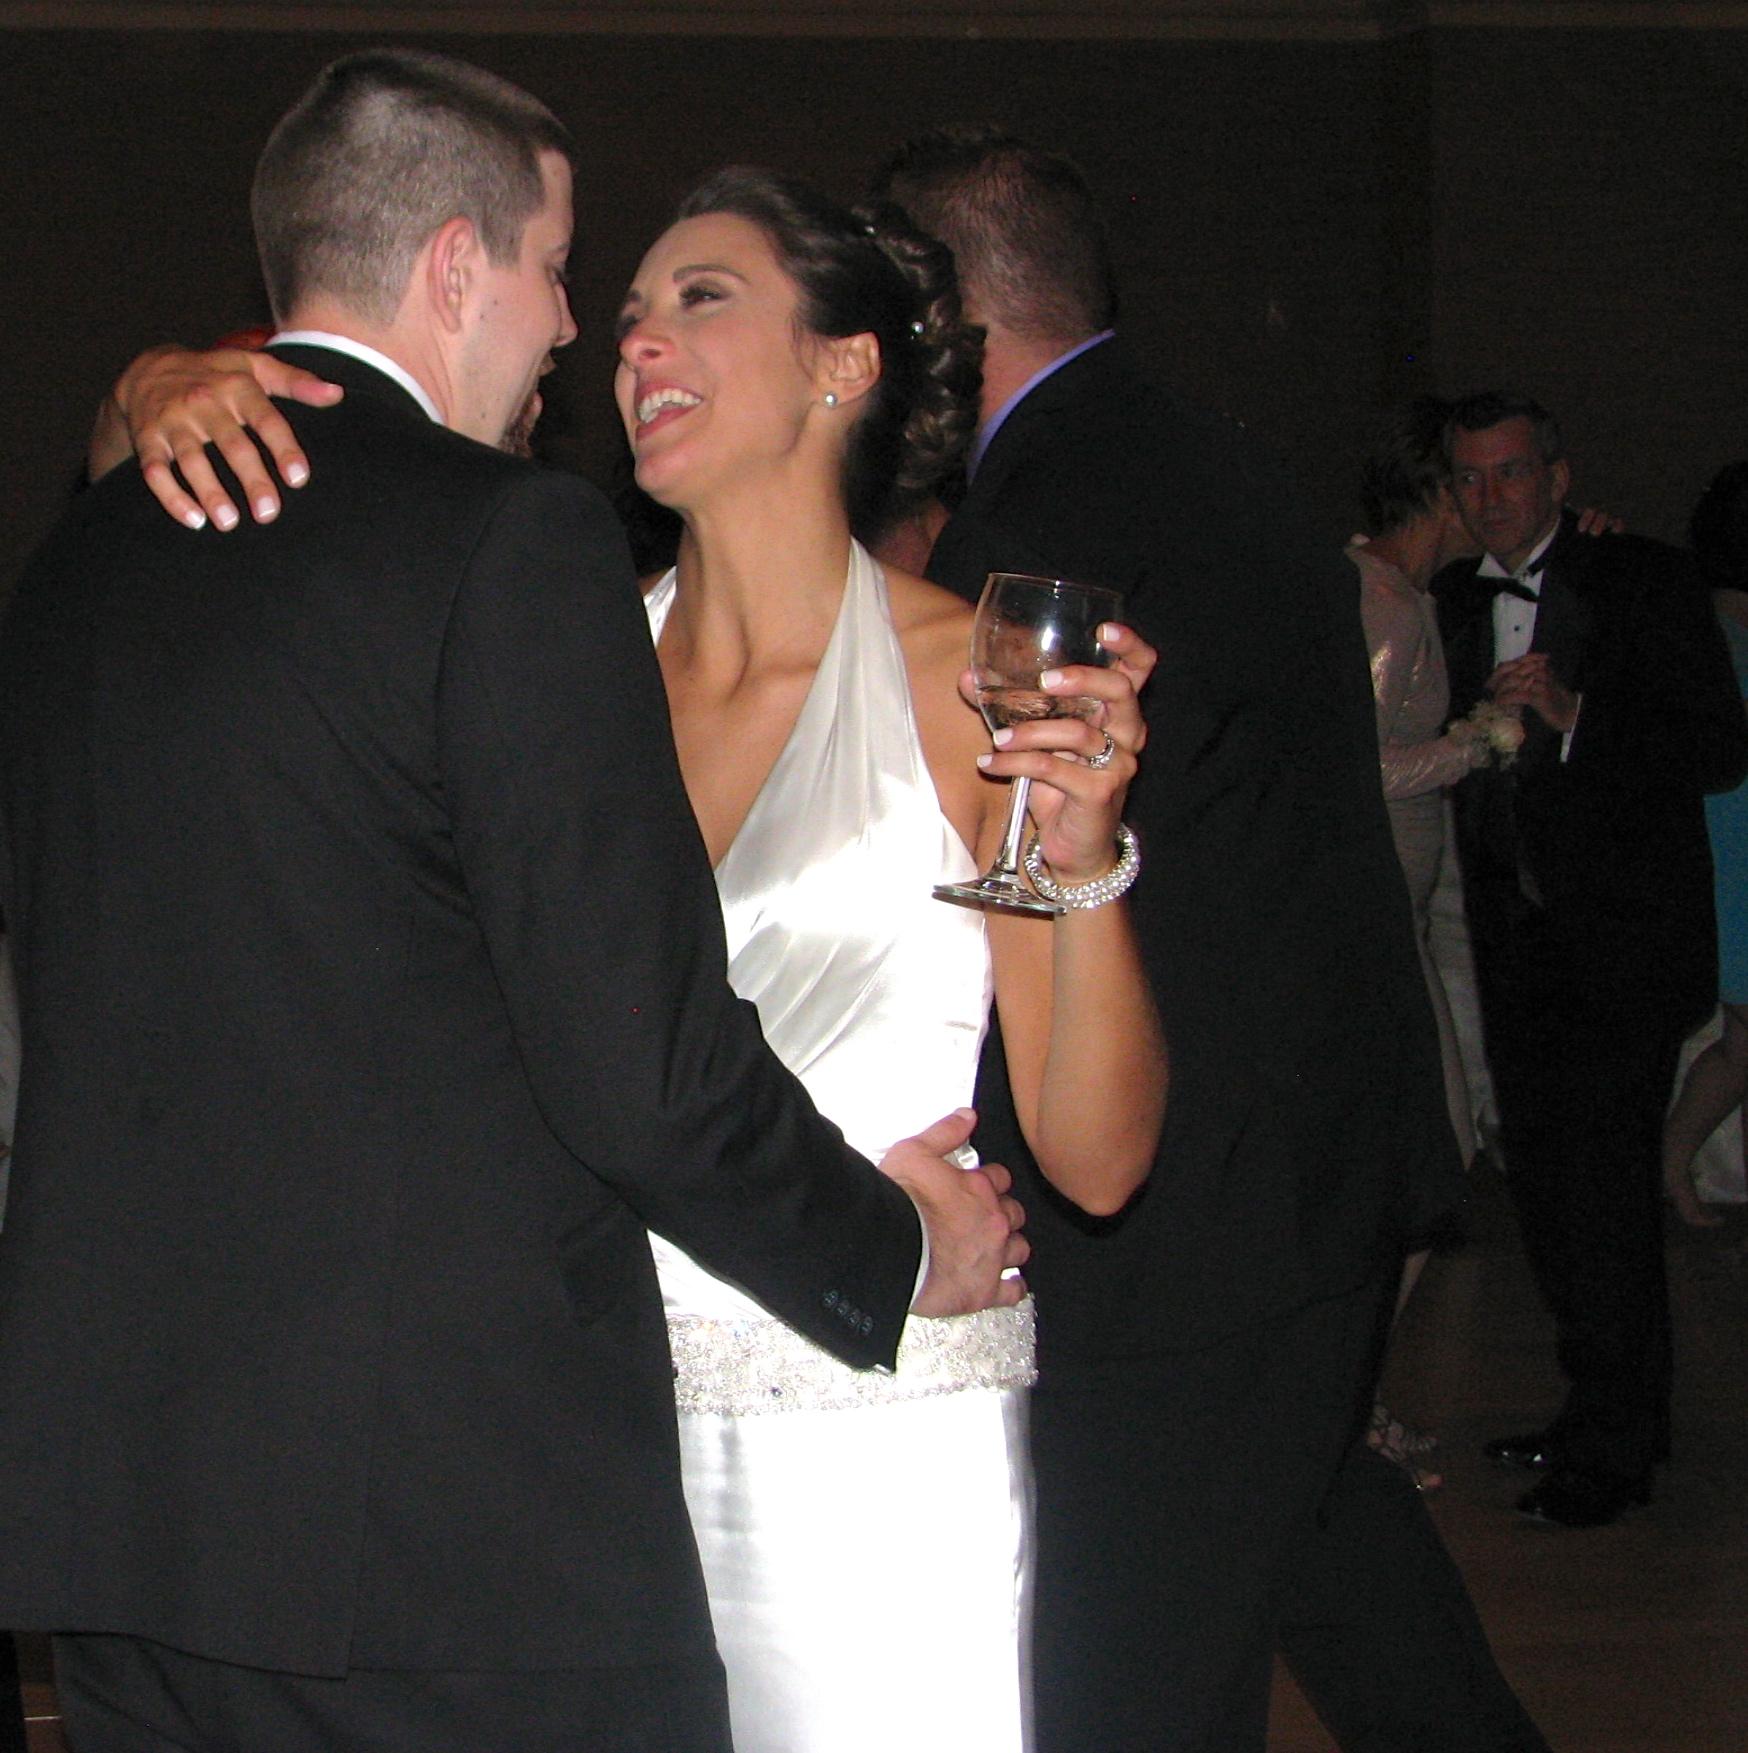 Alexandra Quinceanera Fun Rhode Island Wedding Dj Ri: Rhode Island Wedding DJ